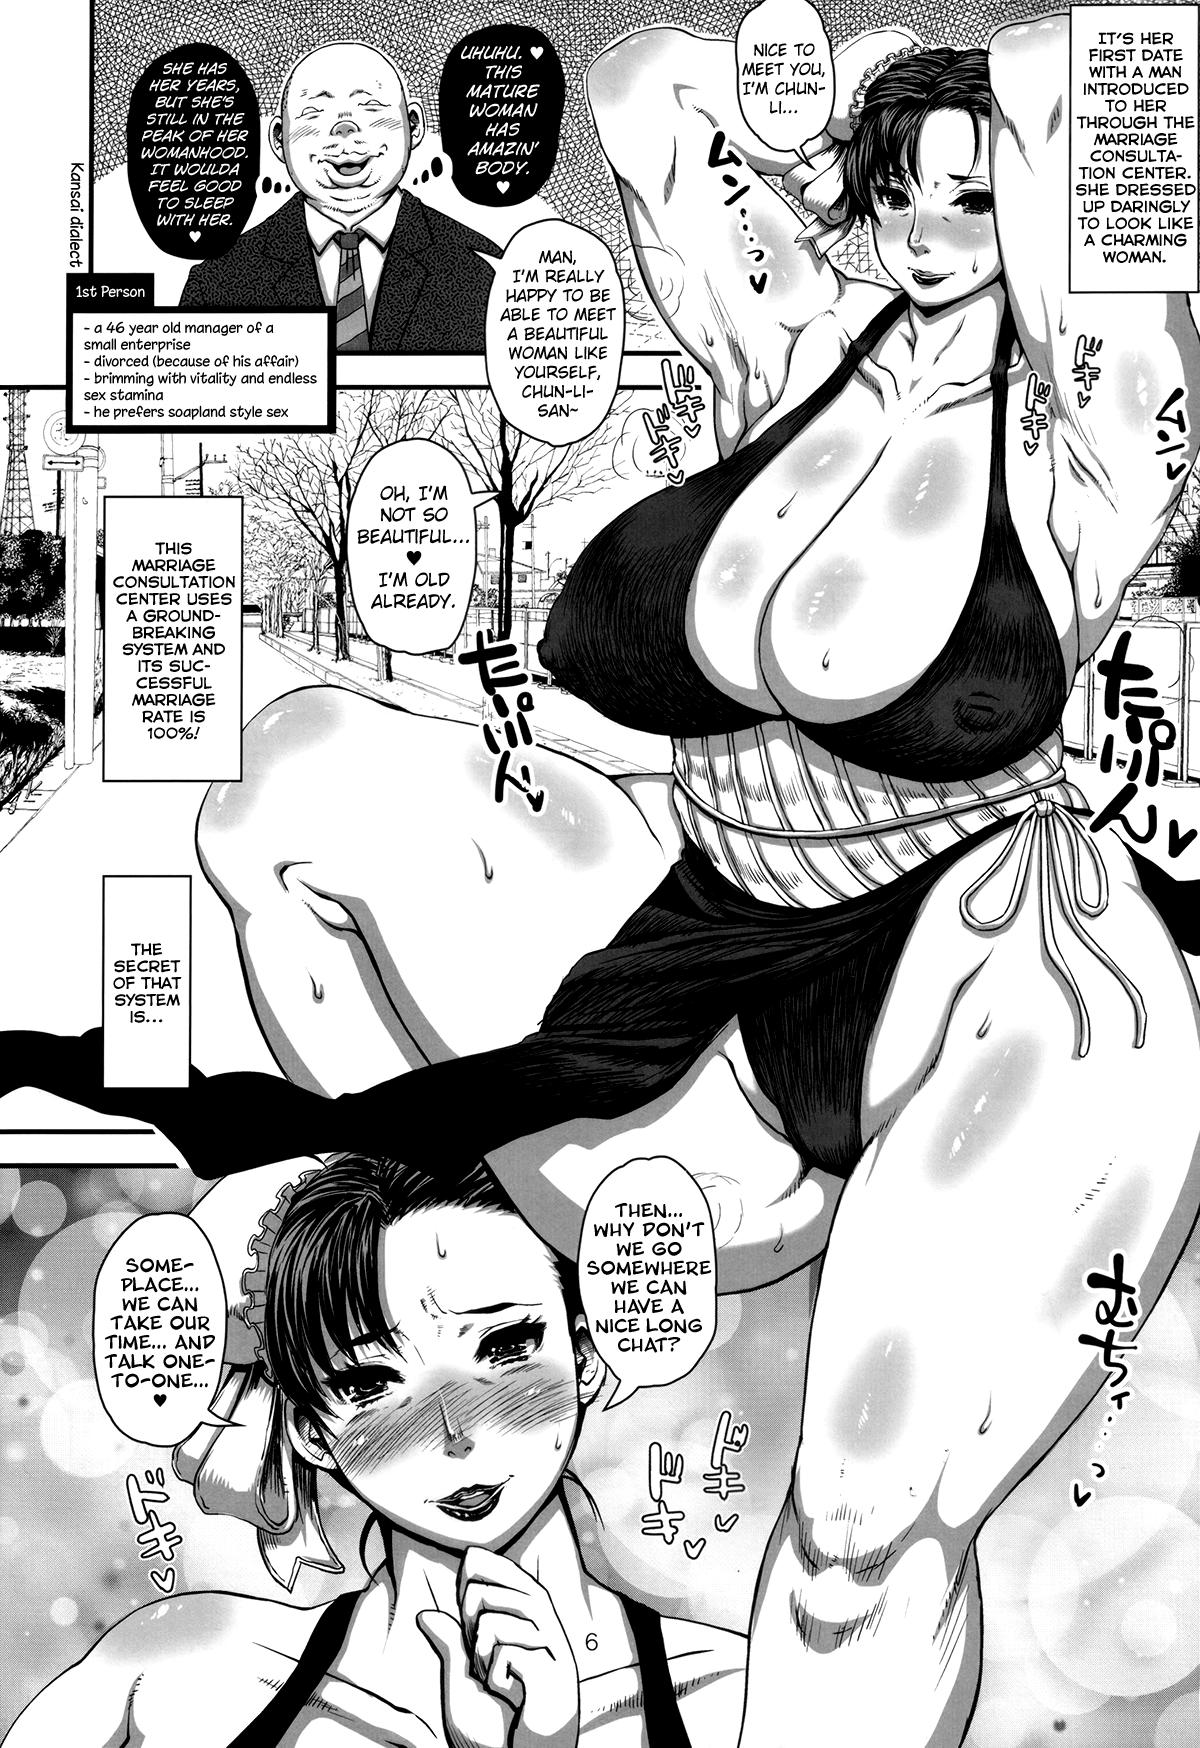 (C87) [8graphica (Yoshitama Ichirou, Nanakichi)] METABOLISM Chun-Li A Beautiful and Mature Chun-Li-san has Serious Sex with the Candidates while Looking For a Marriage Partner. (Street Fighter) [English] [biribiri] 4